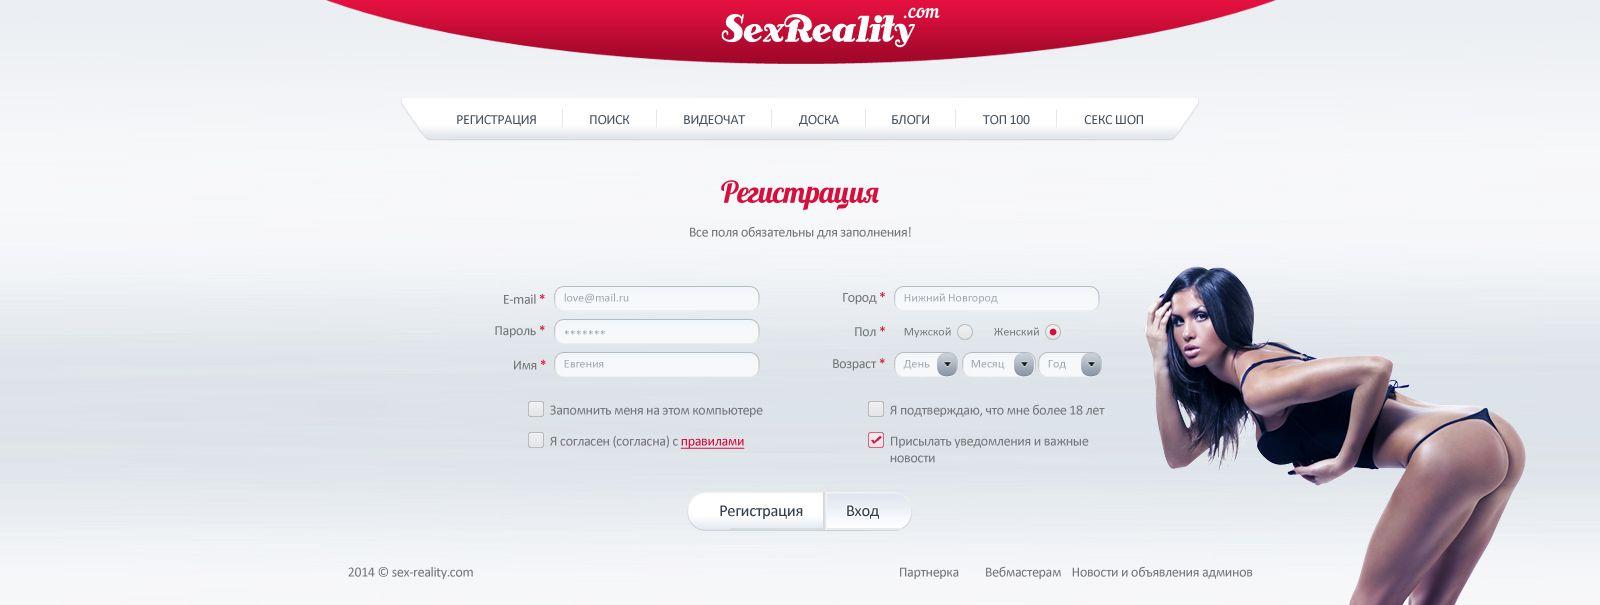 Сайт для интимзнакомств